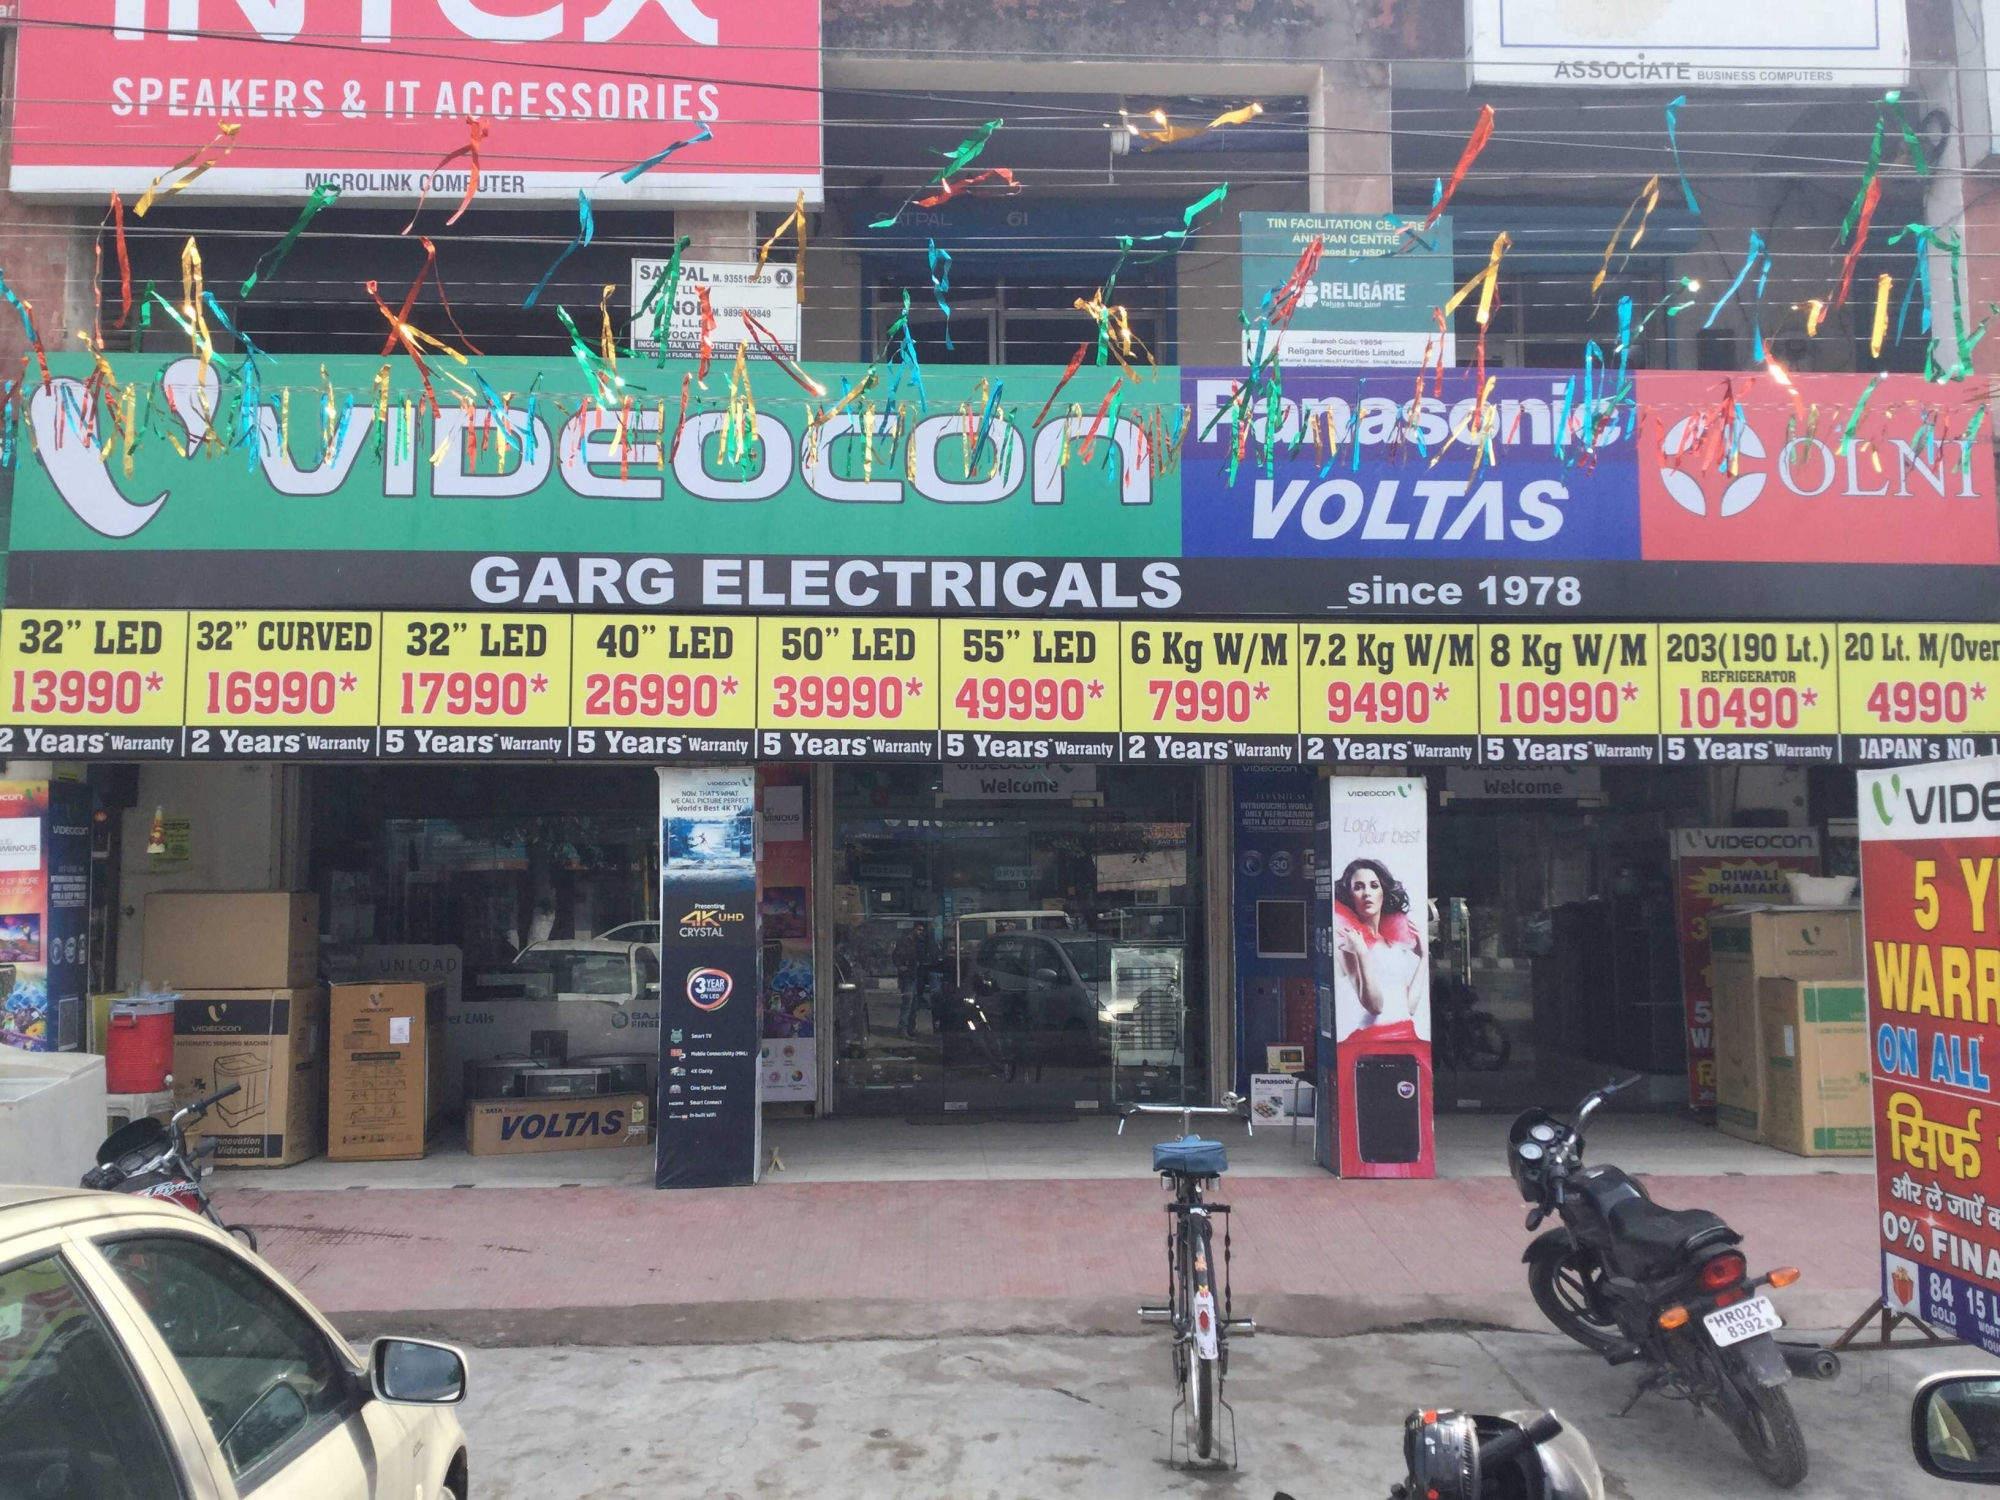 Top Funai Led Tv Dealers in Yamunanagar - Best Funai Led Tv Dealers